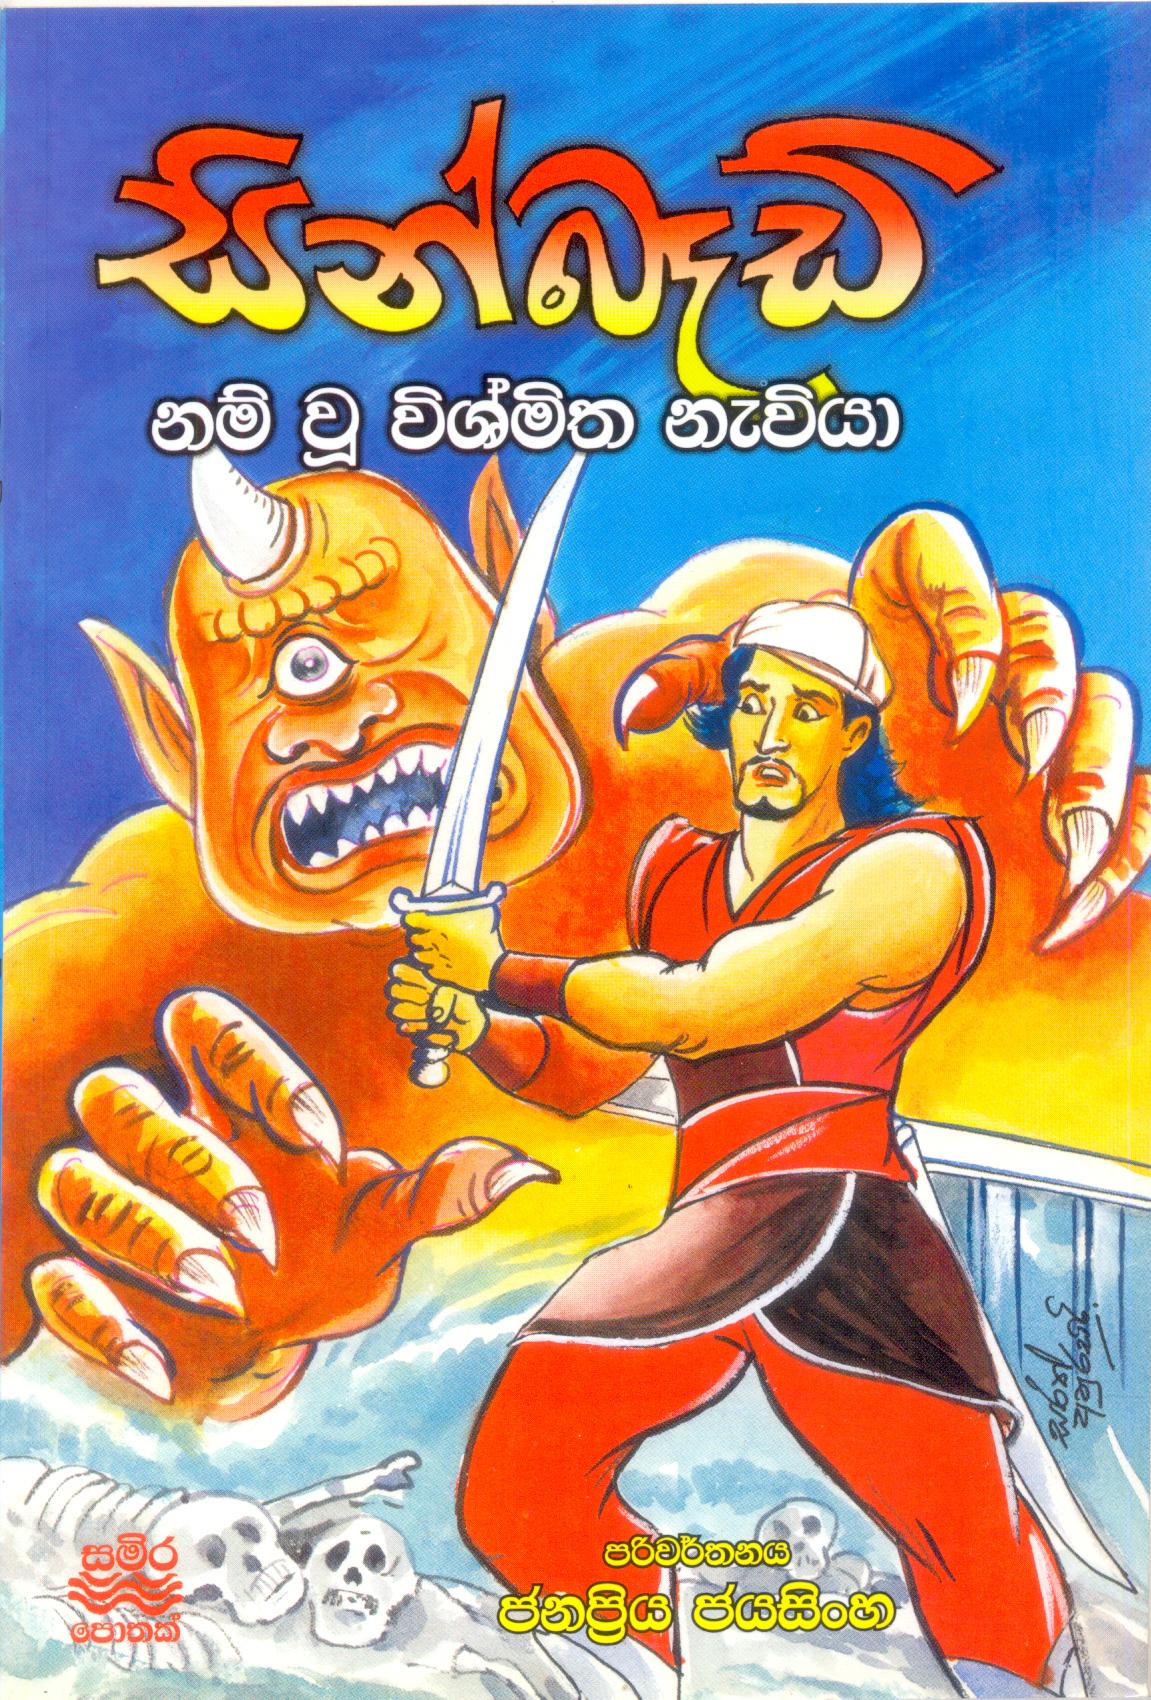 Simbad nam Wu Vishmitha Naviya